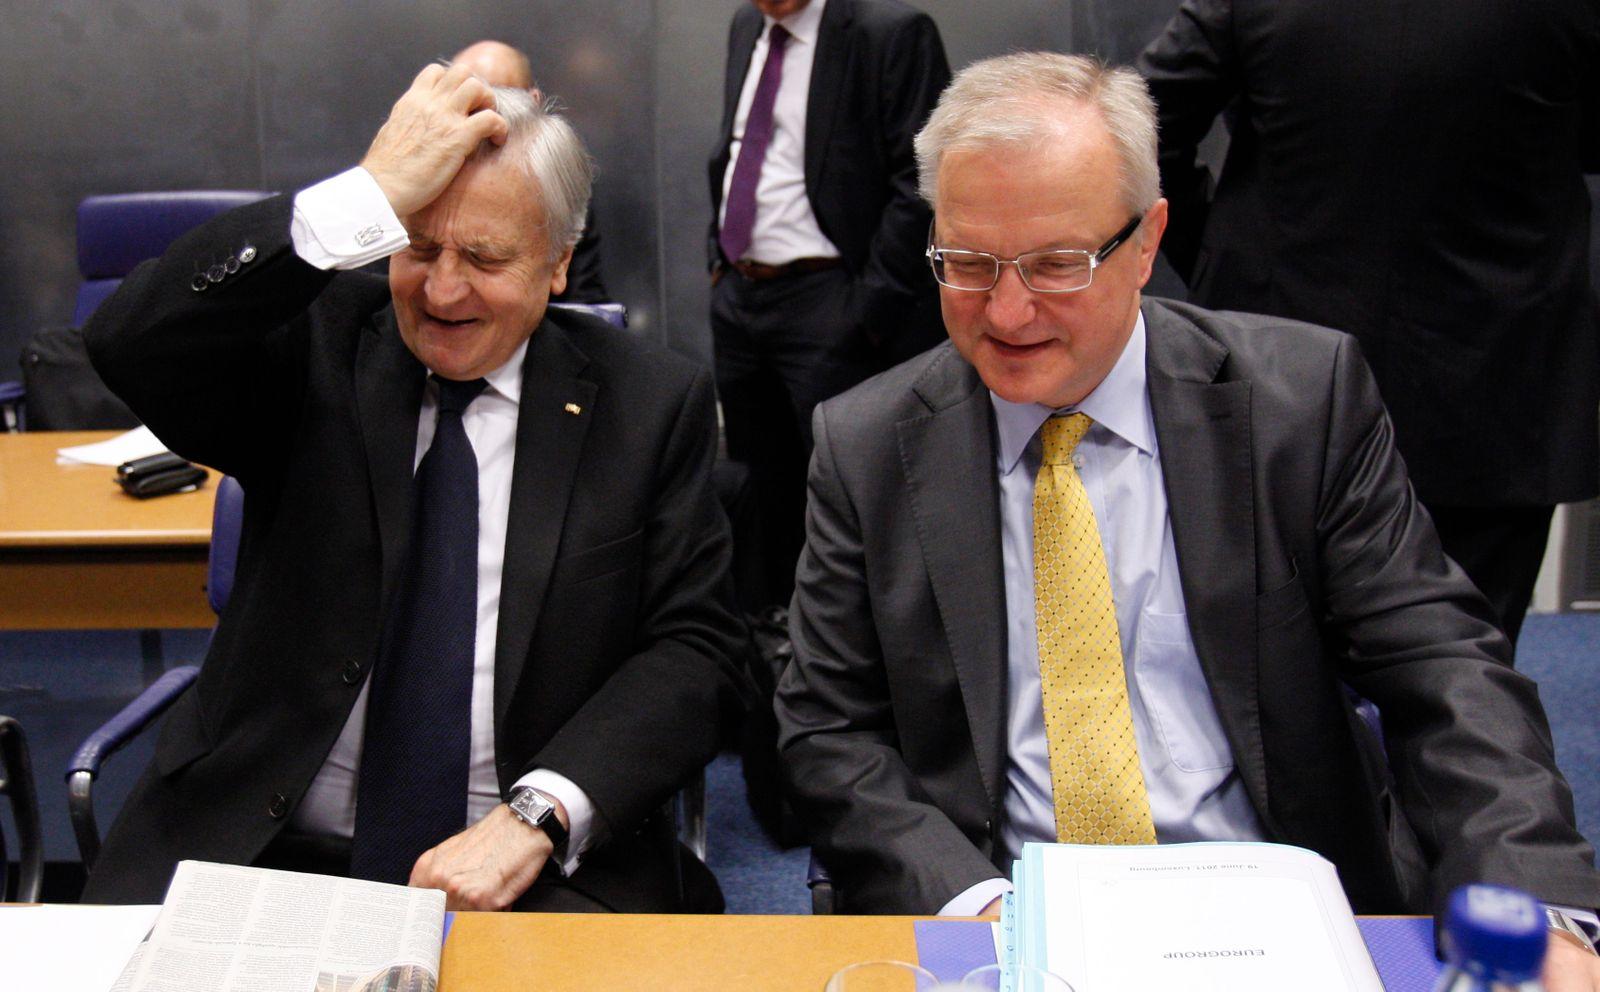 Jean-Claude Trichet/ Olli Rehn